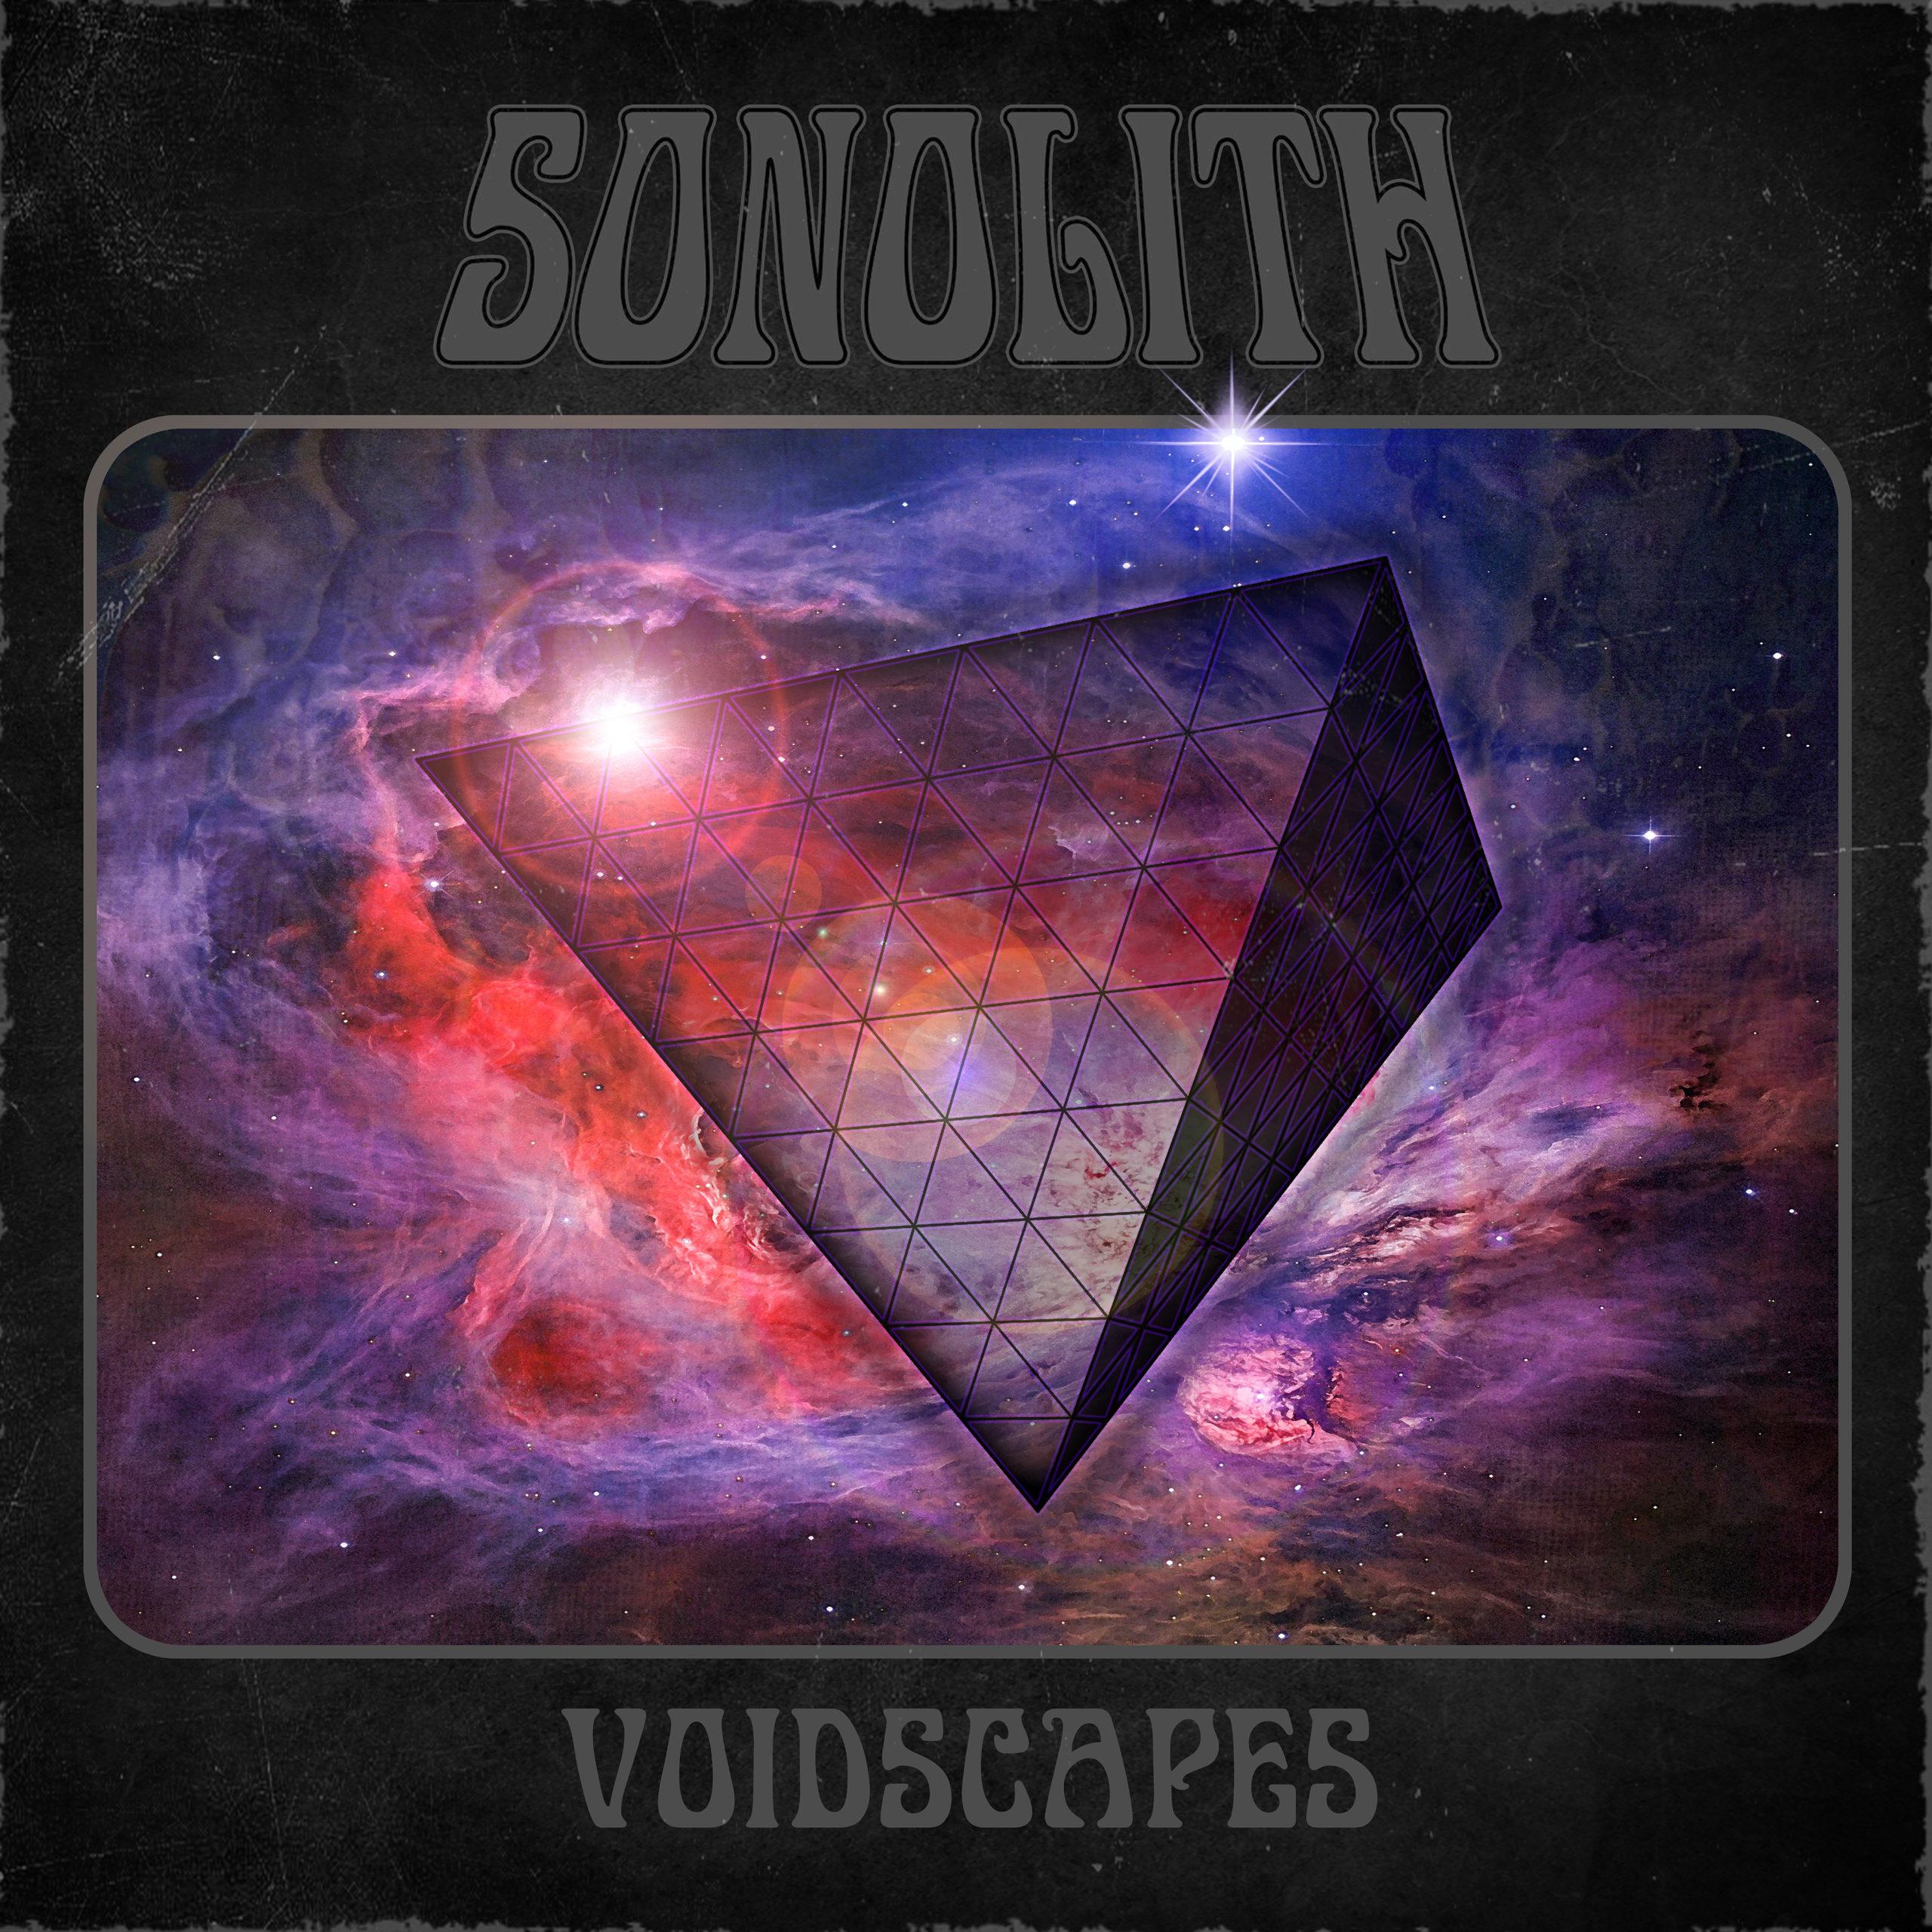 Sonolith Voidscapes